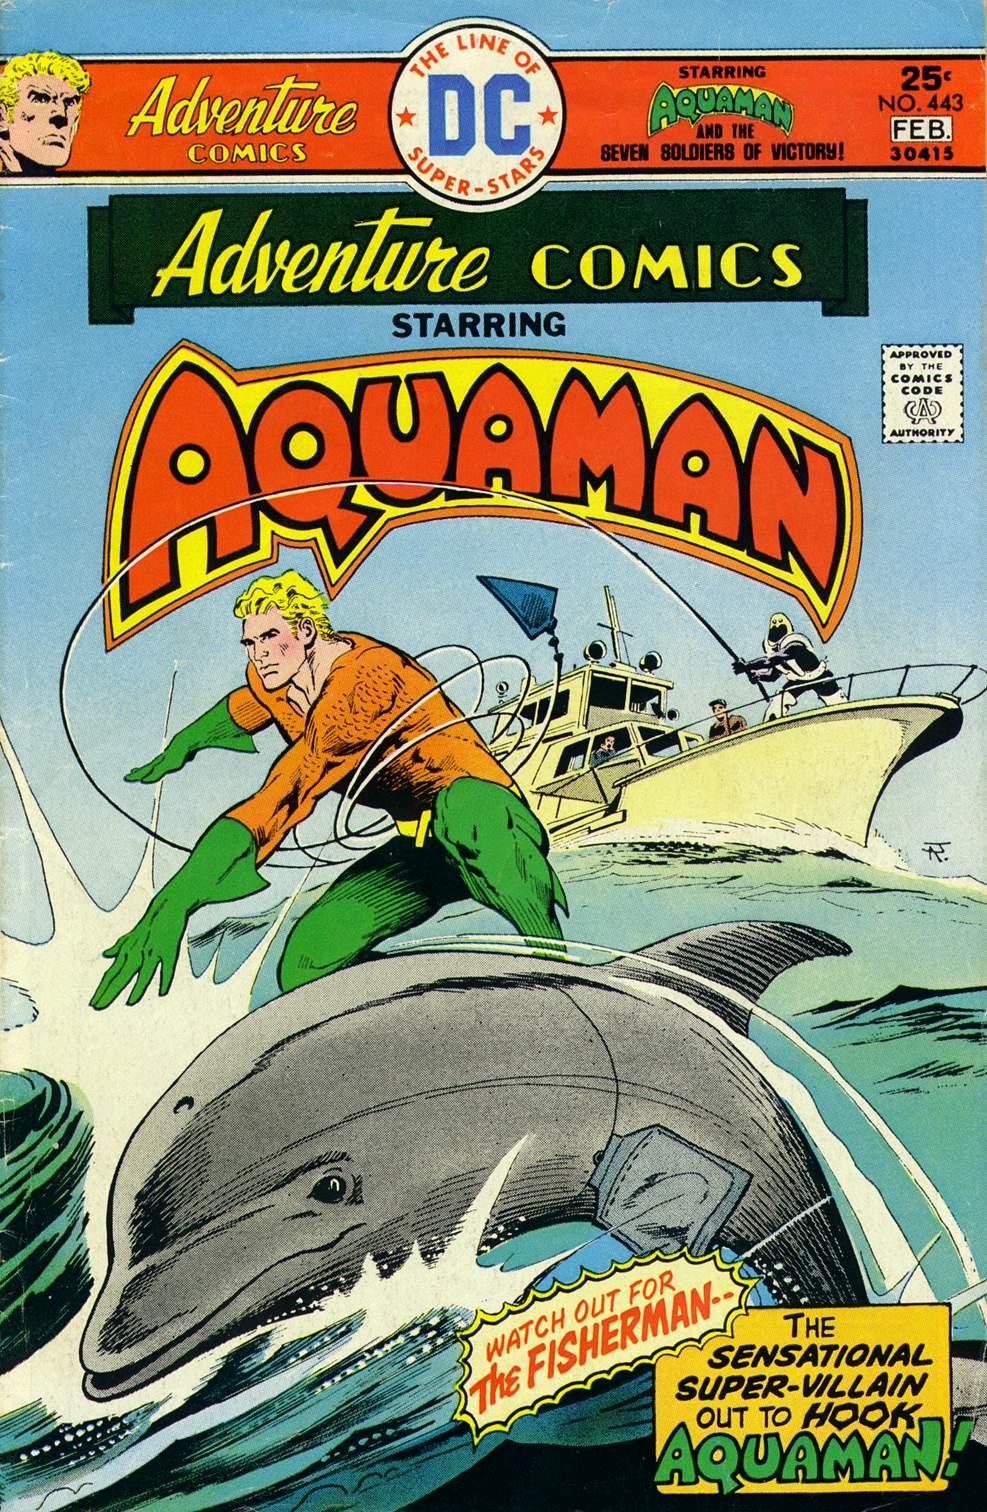 Adventure Comics (1938) 443 Page 1